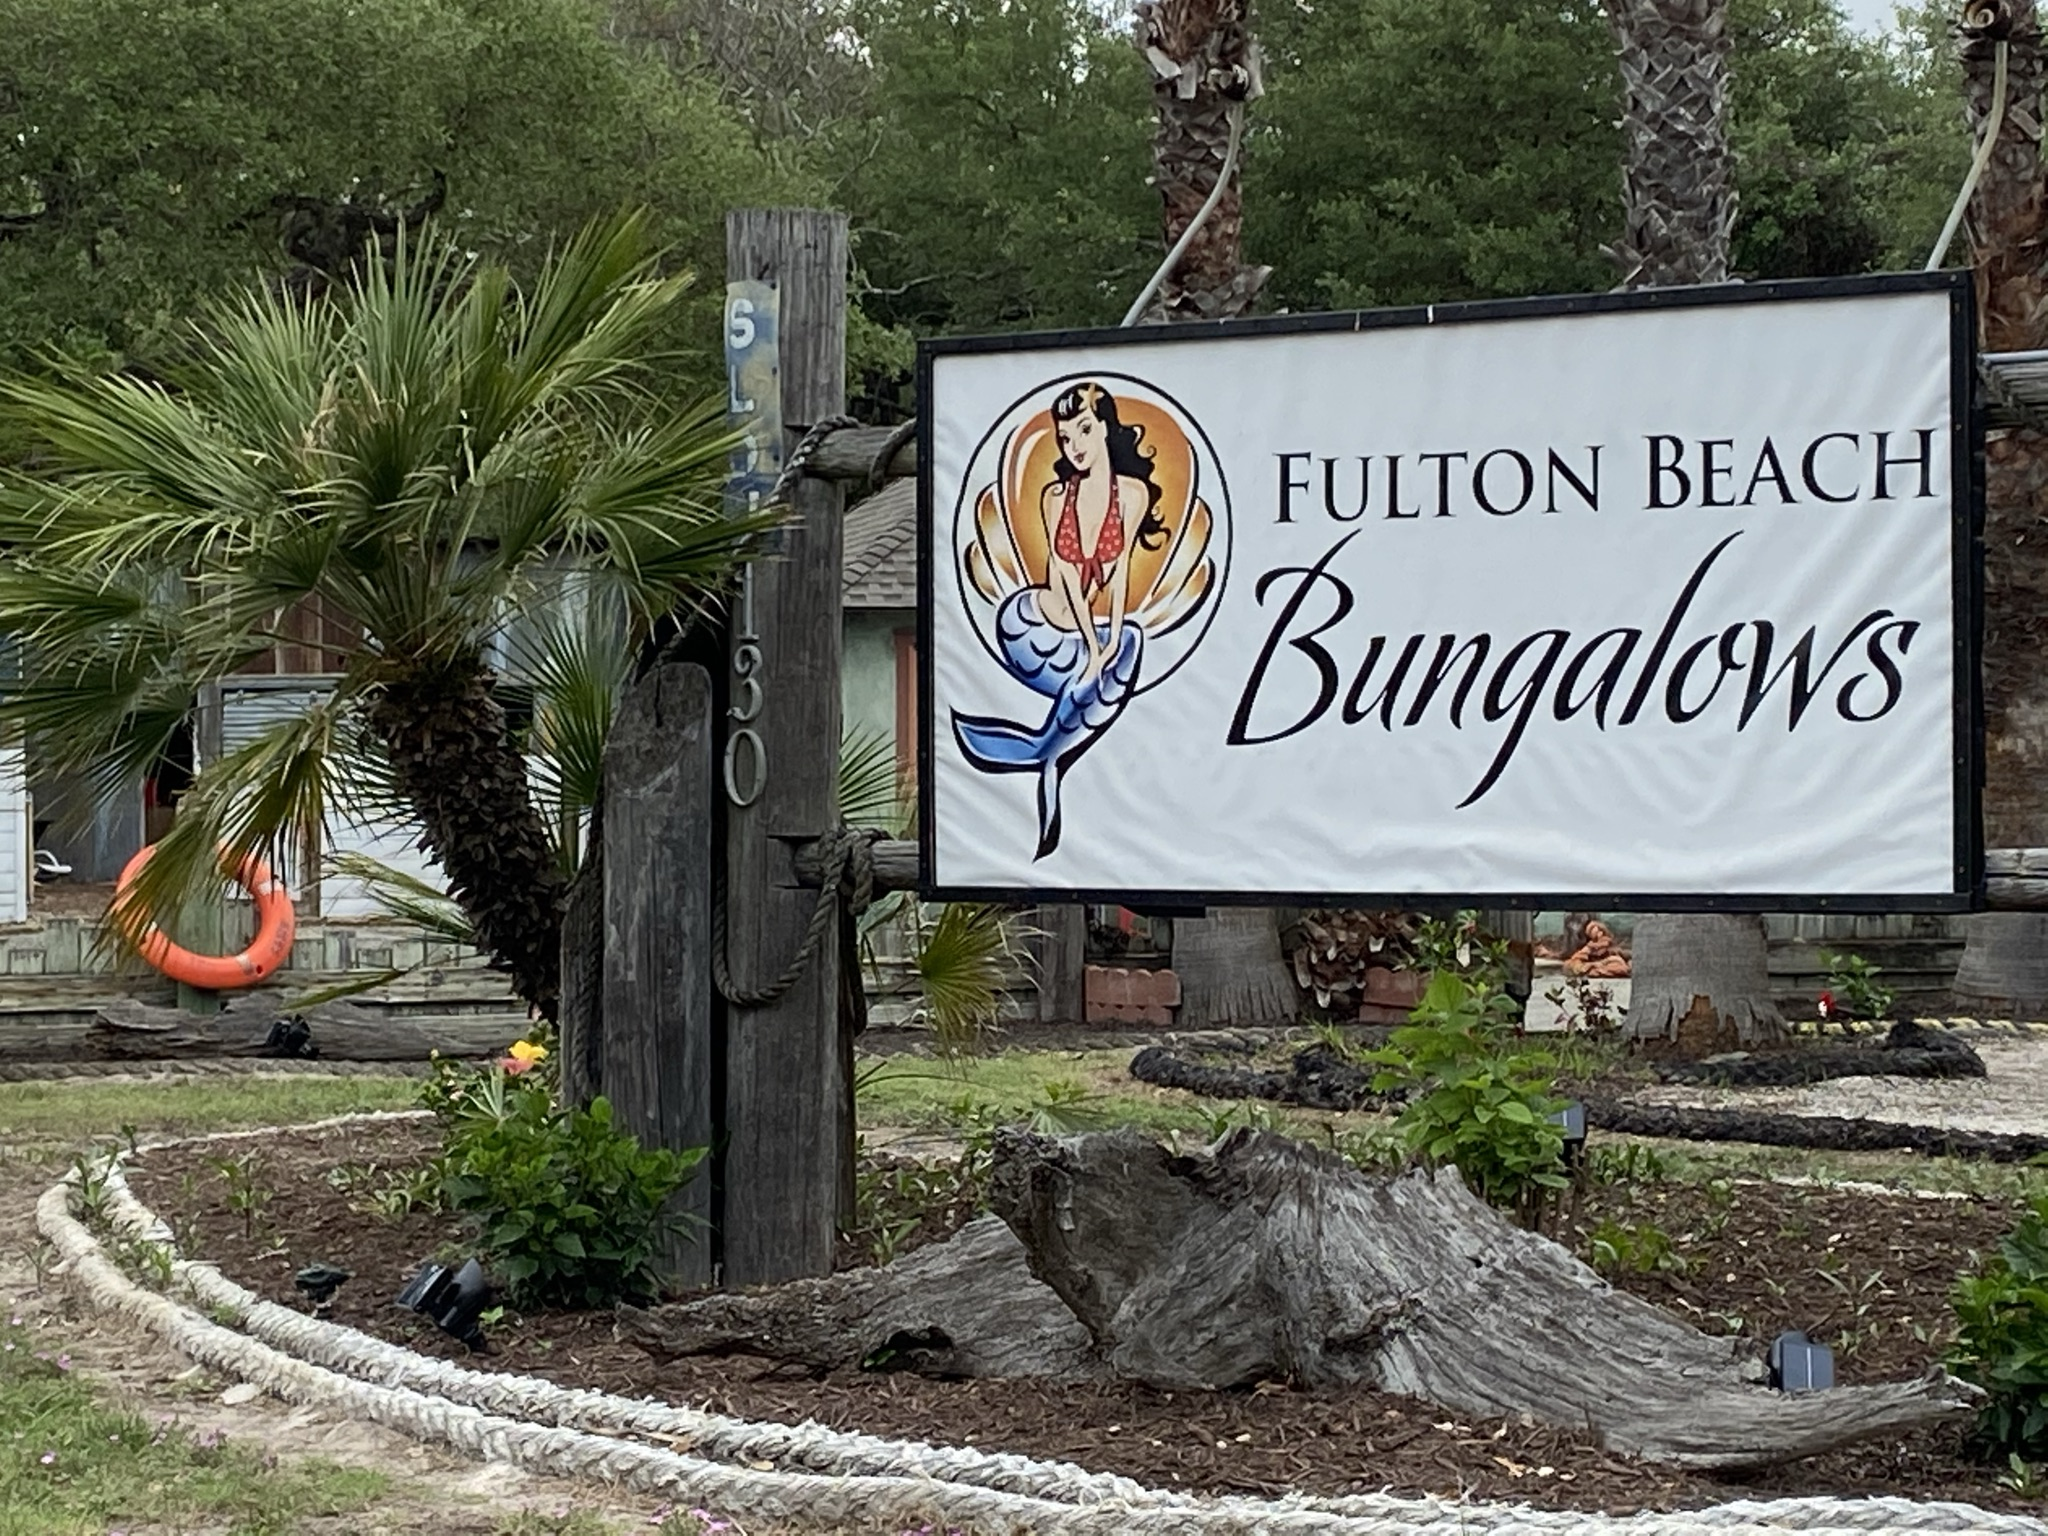 Fulton Beach Bungalows